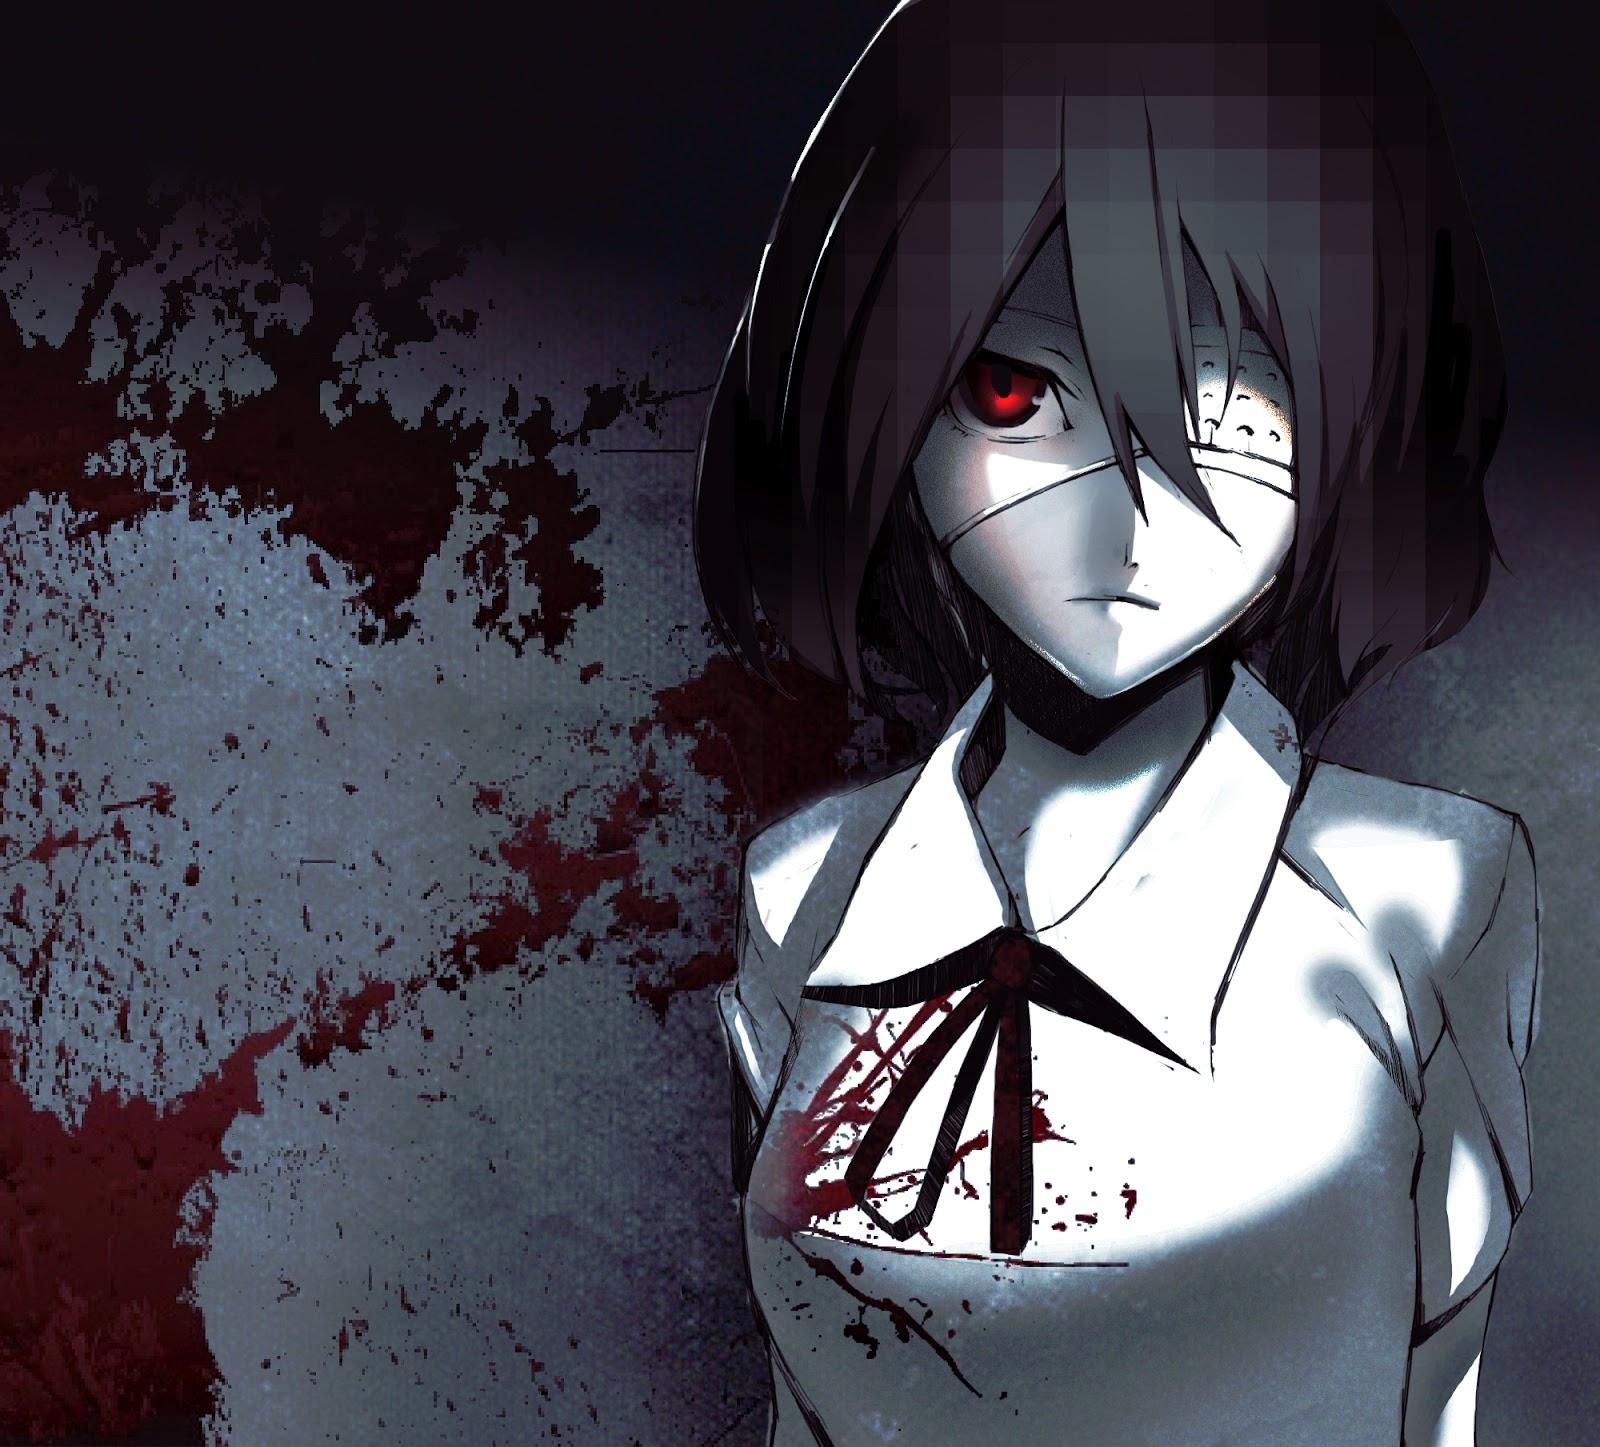 S animes Imagenes wallpaper anime